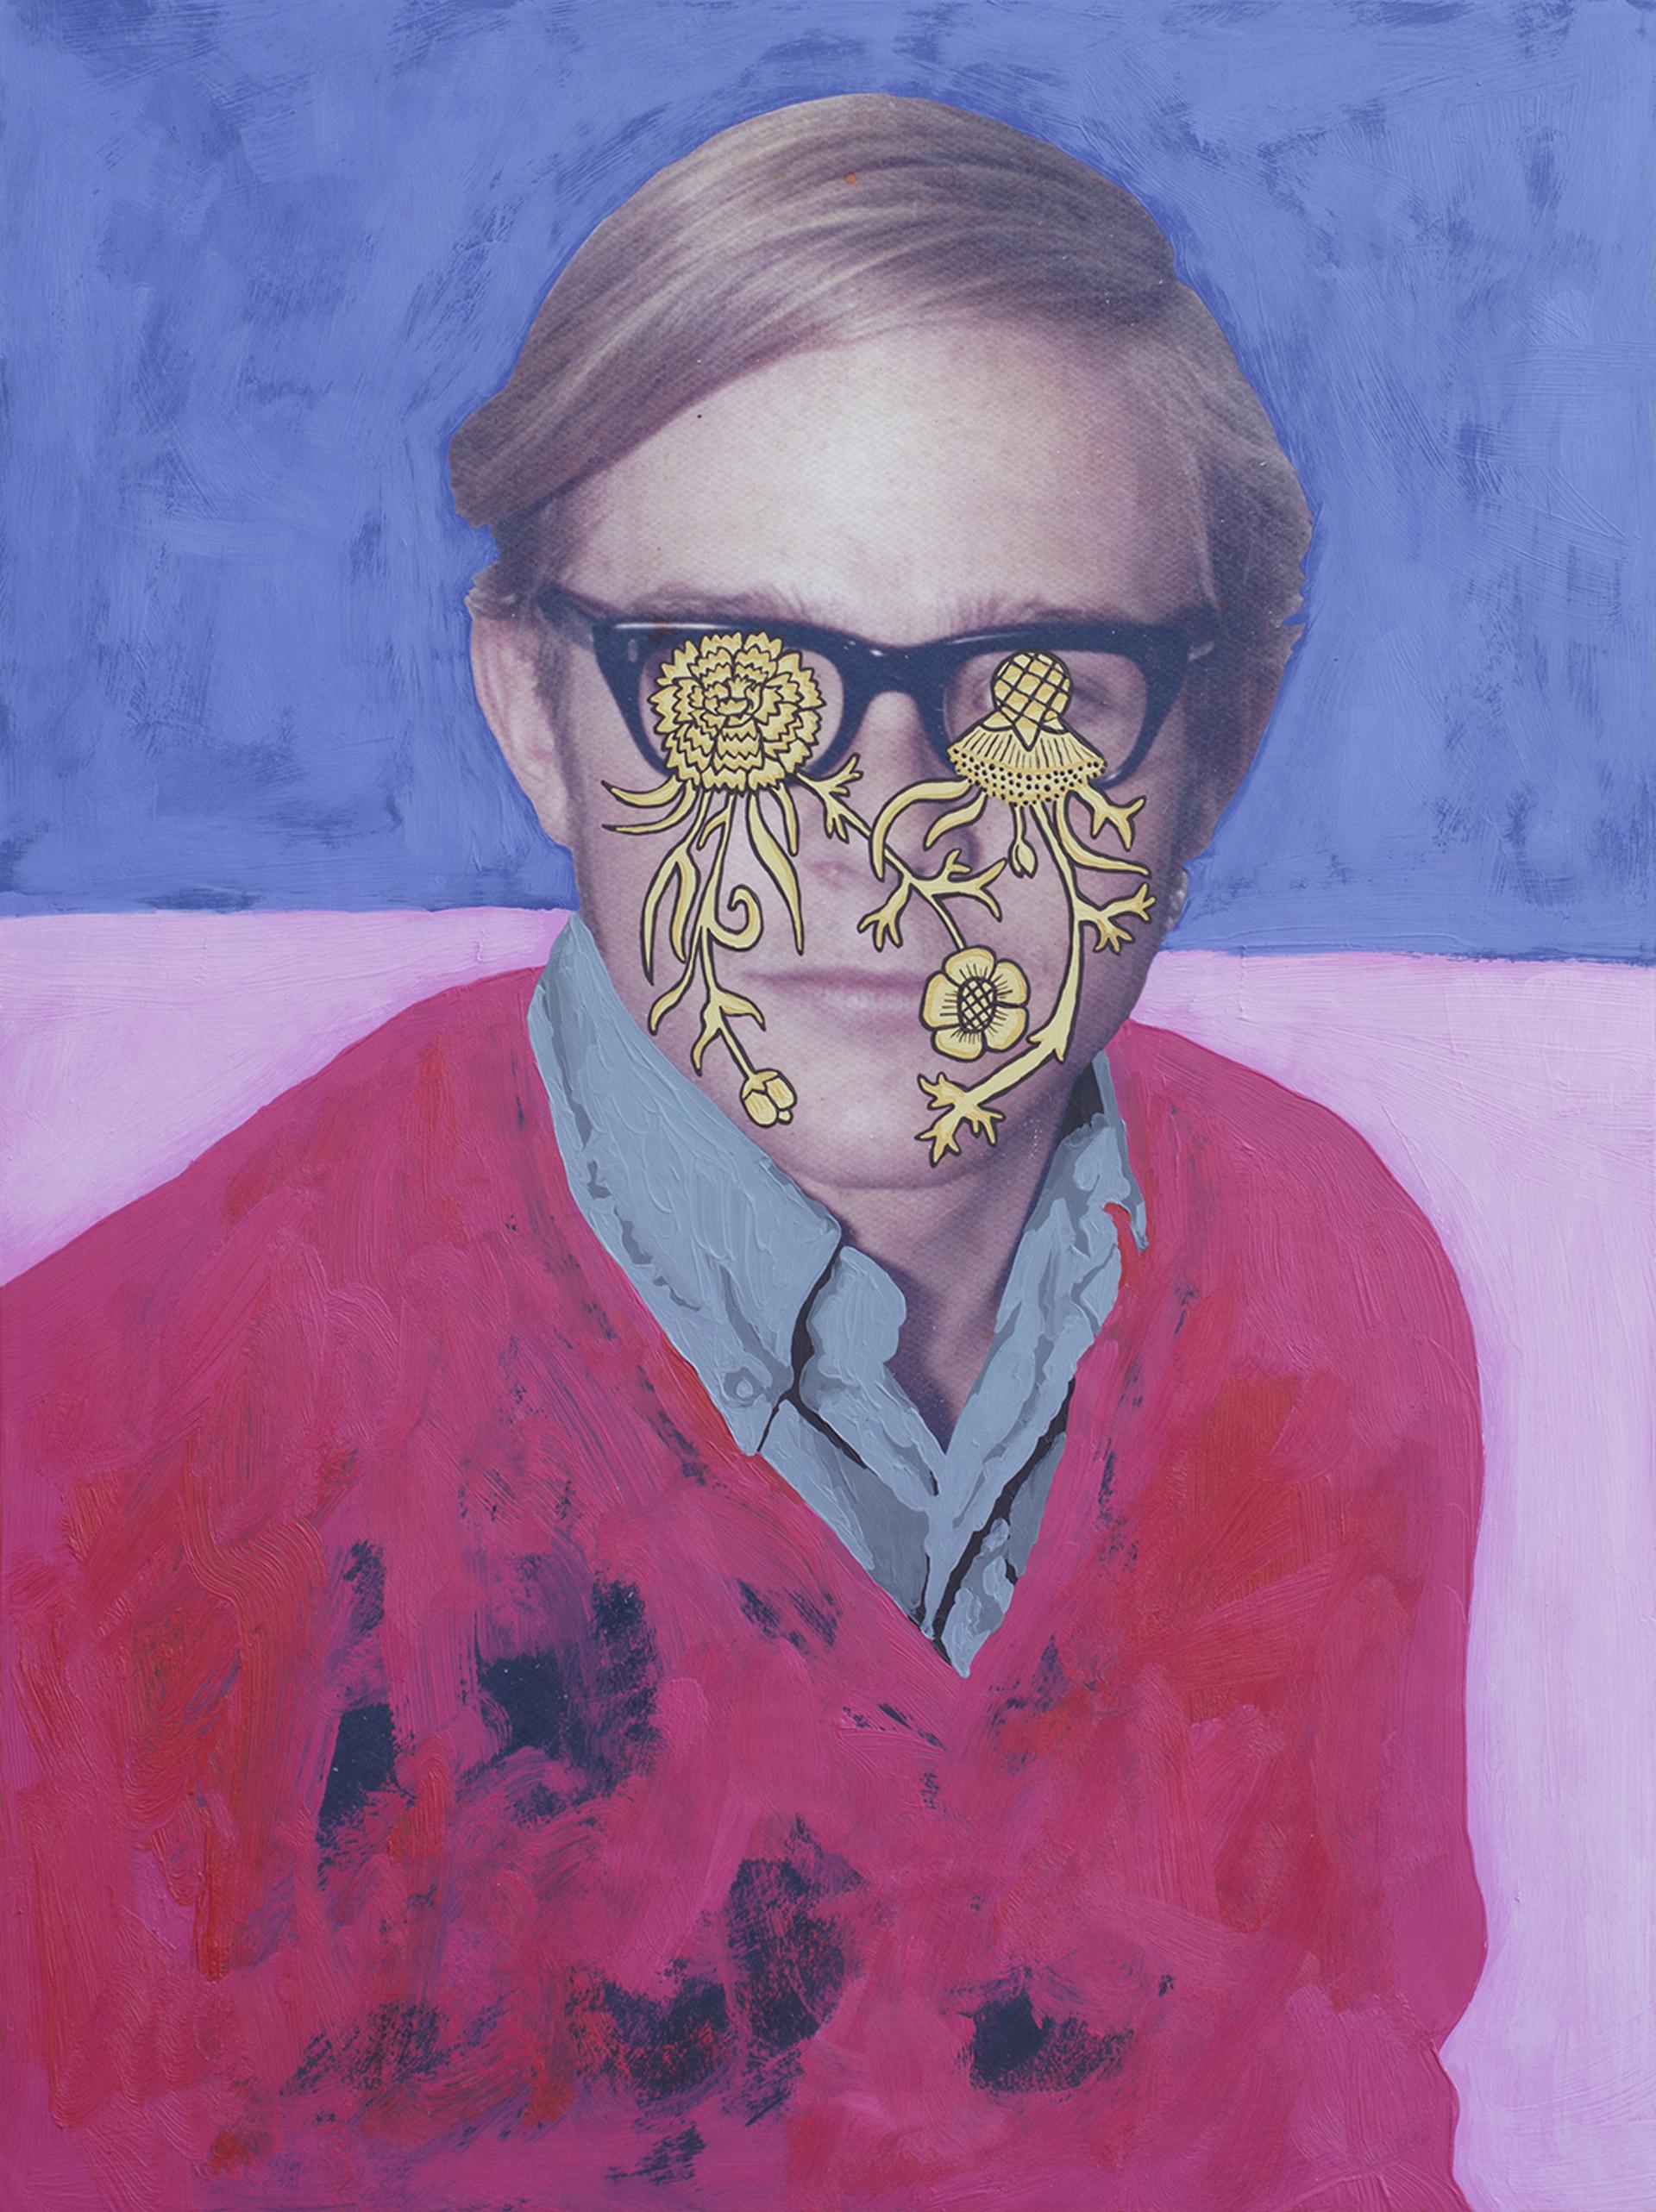 Untitled (Flower Eyes) by Daisy Patton